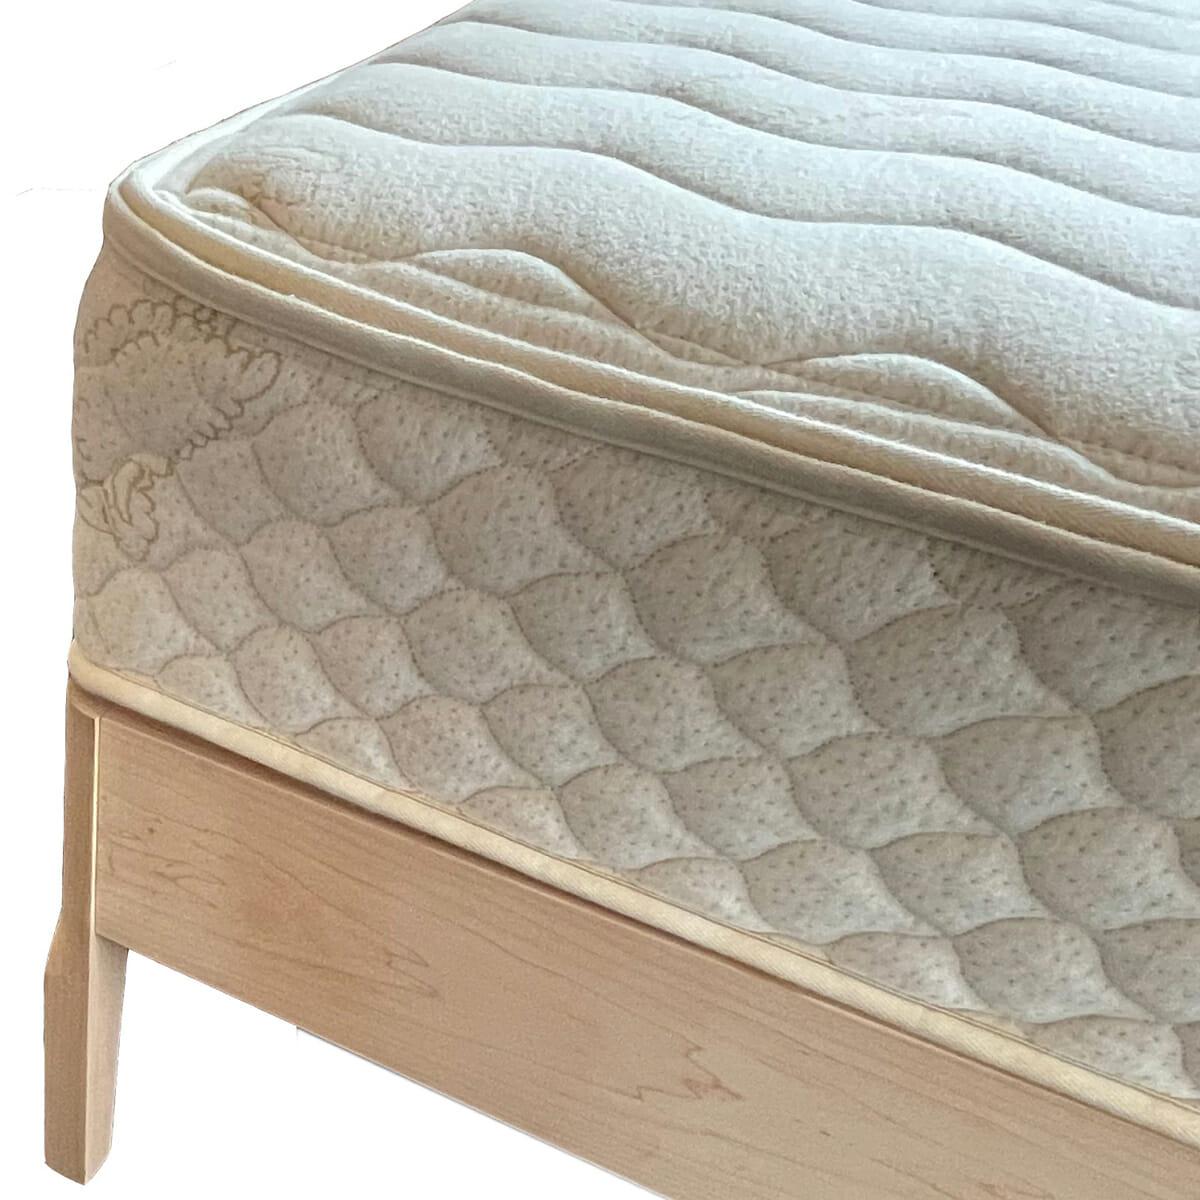 Maple Platform Bed Finished with Euro Slats